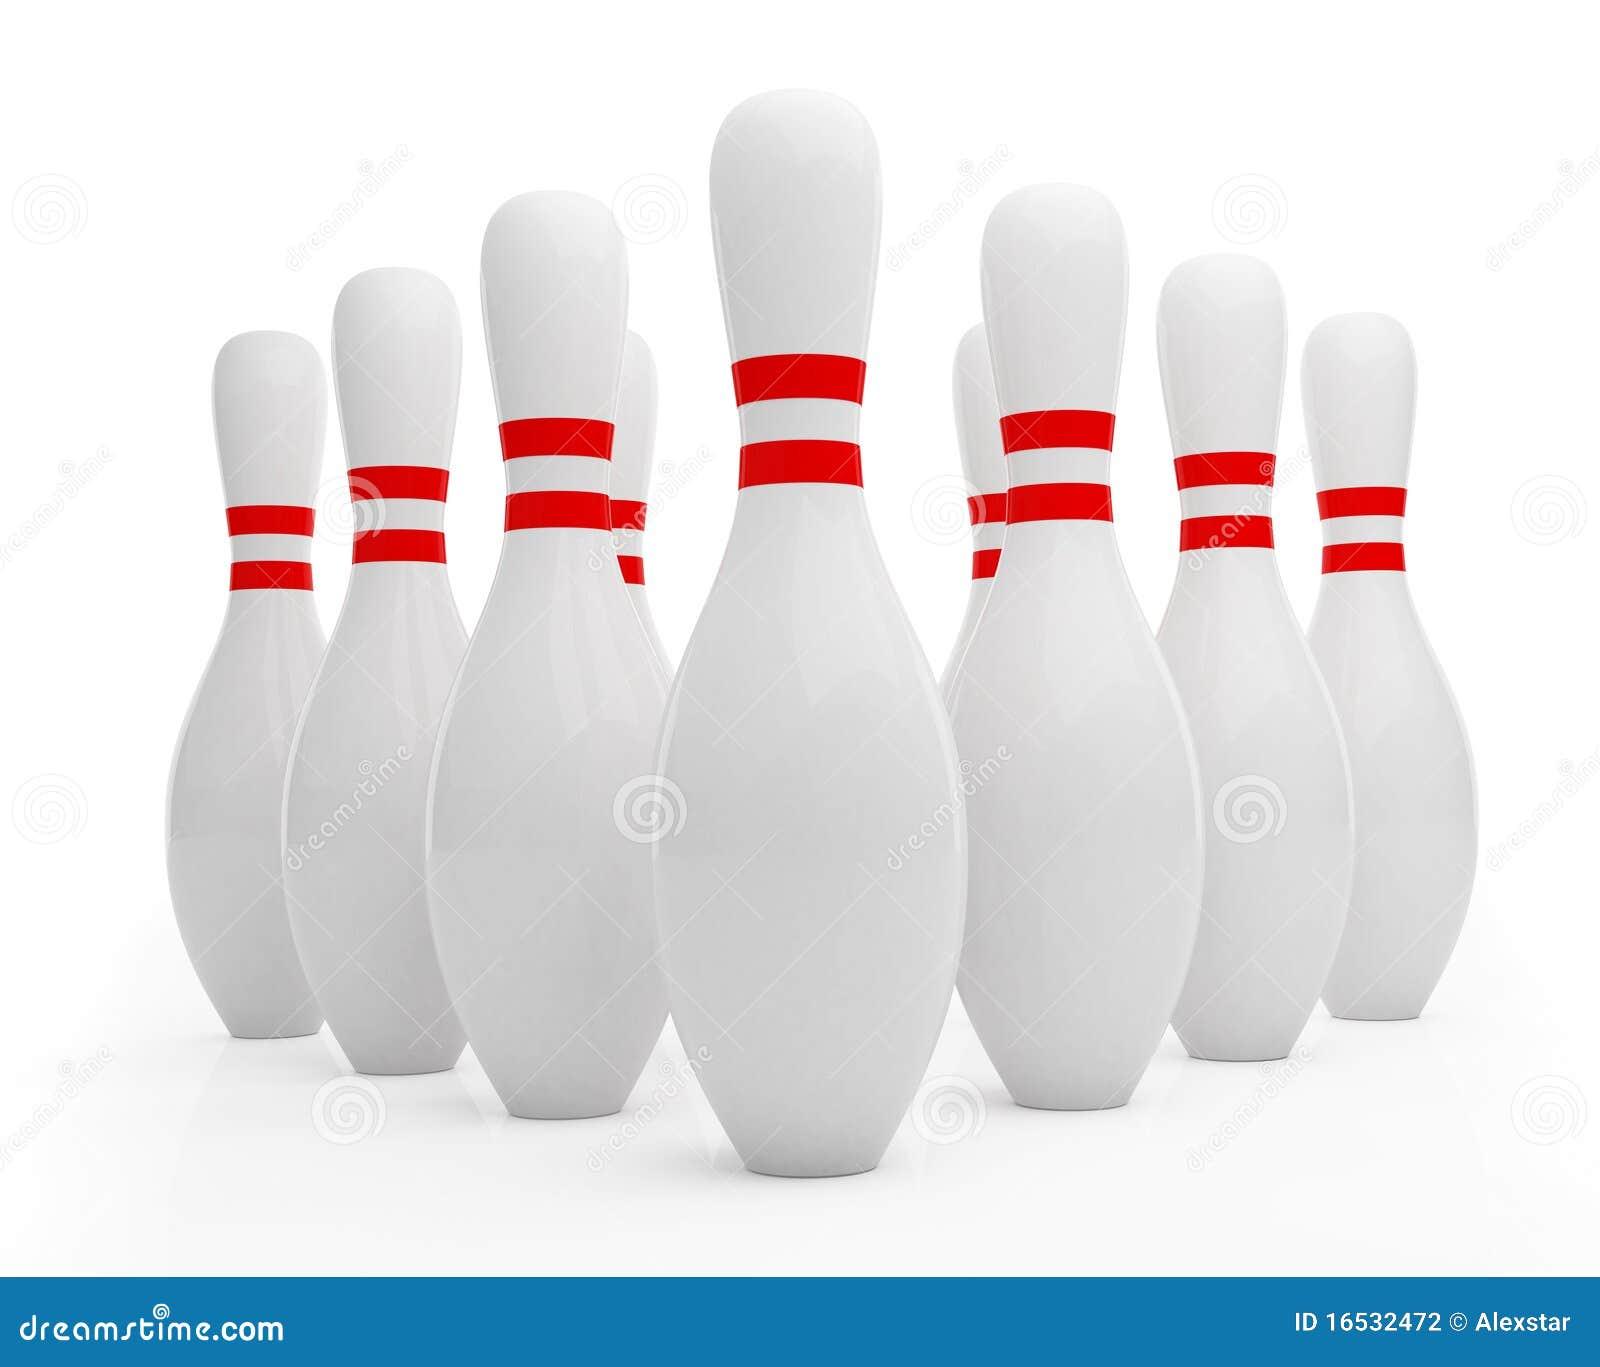 Ten pin bowling skittles stock illustration. Illustration of pins ...